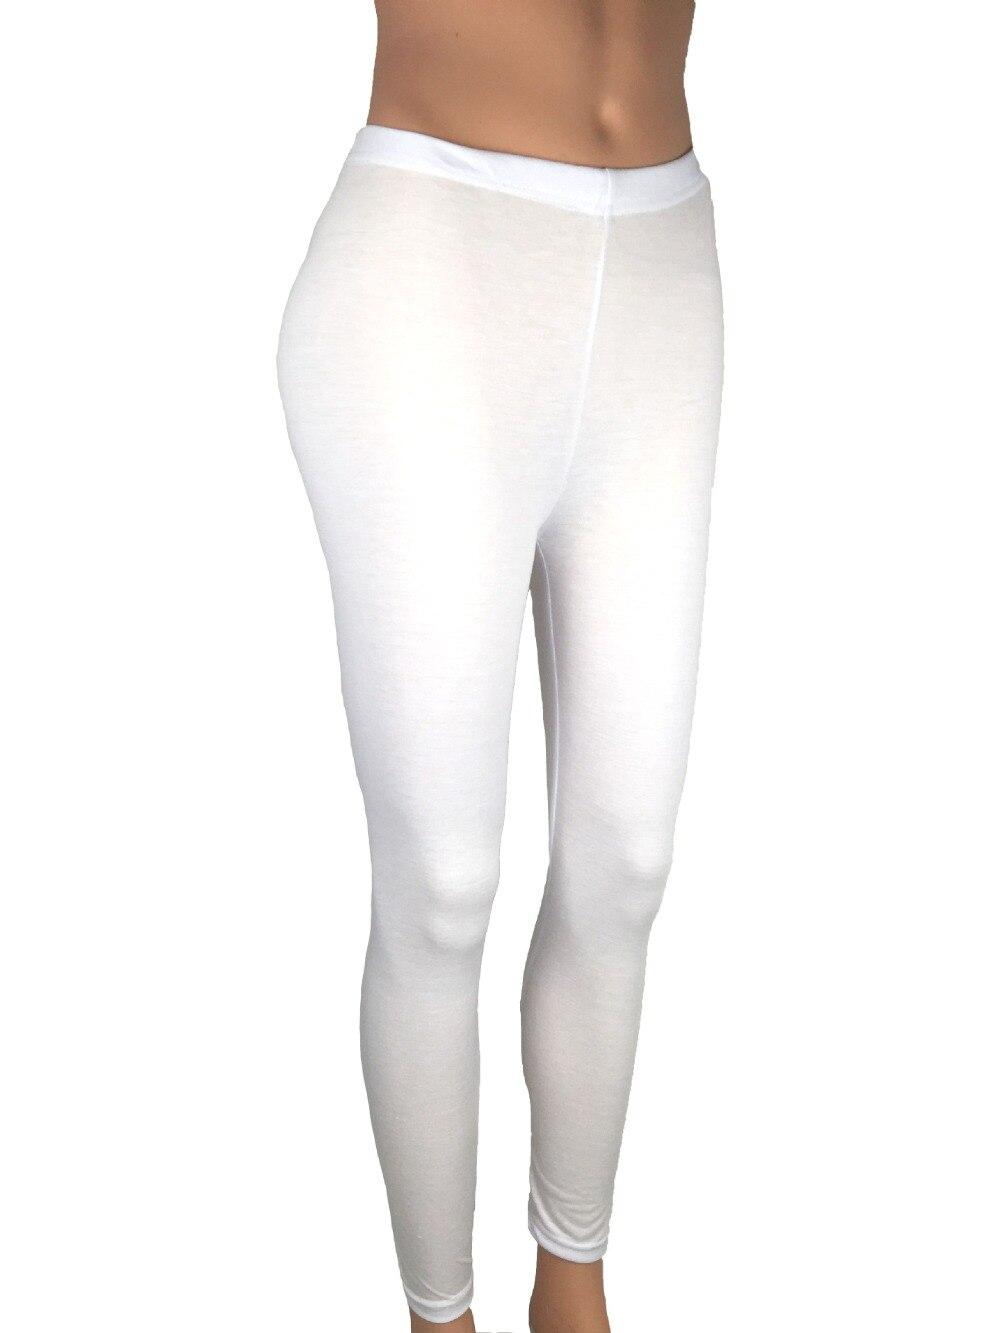 Sólido algodón mujeres leggings HTB1EFIVc mWBKNjSZFBq6xxUFXaq